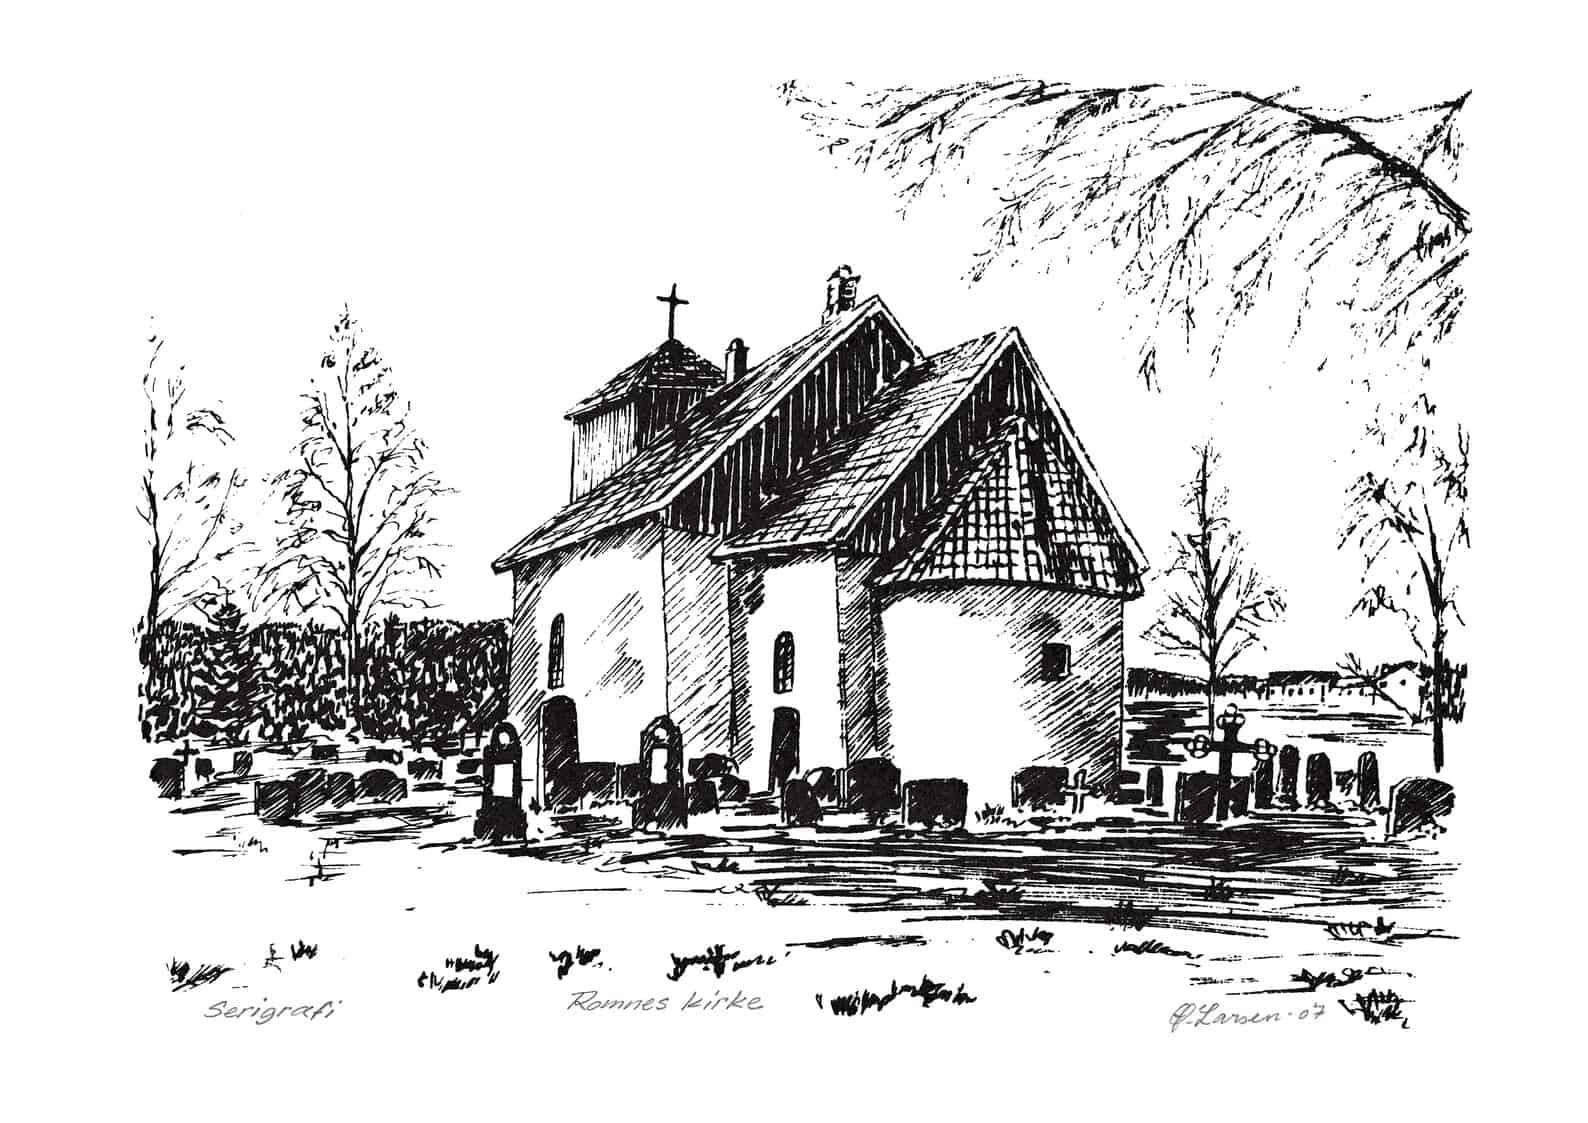 Øyvind Larsen: Romnes kirke (2007)